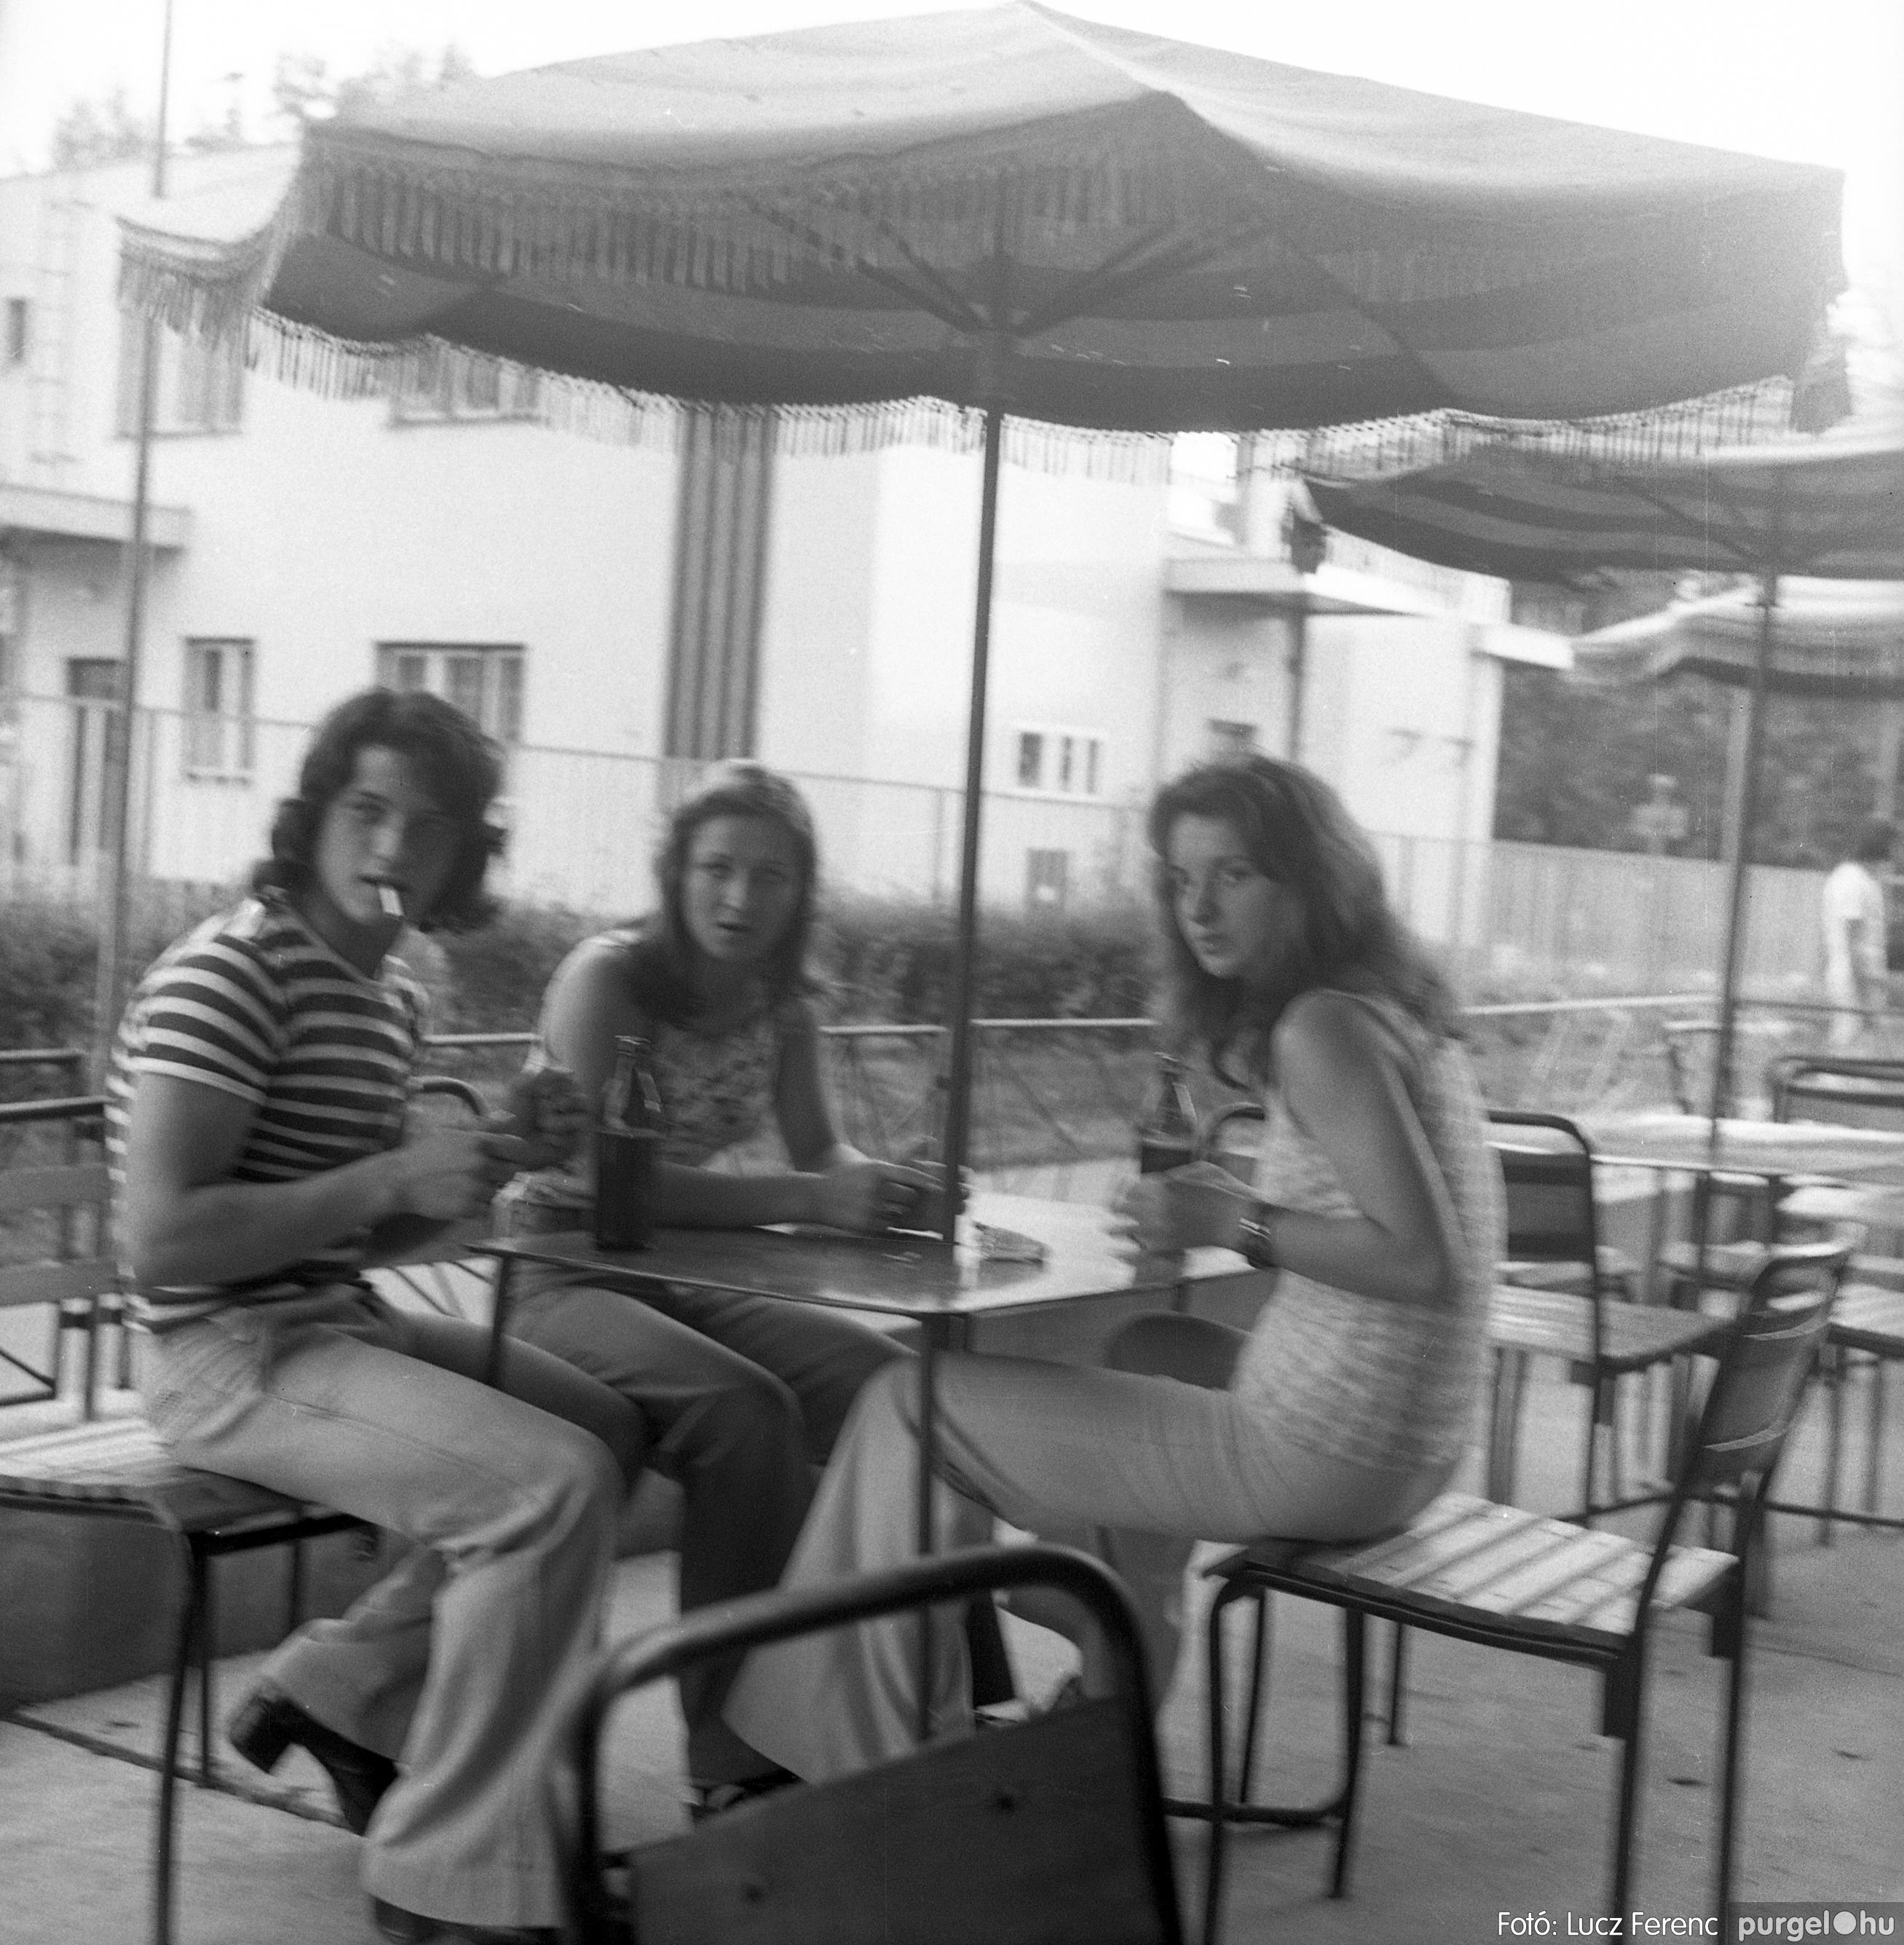 027. 1975. Buli a kultúrban 009. - Fotó: Lucz Ferenc.jpg